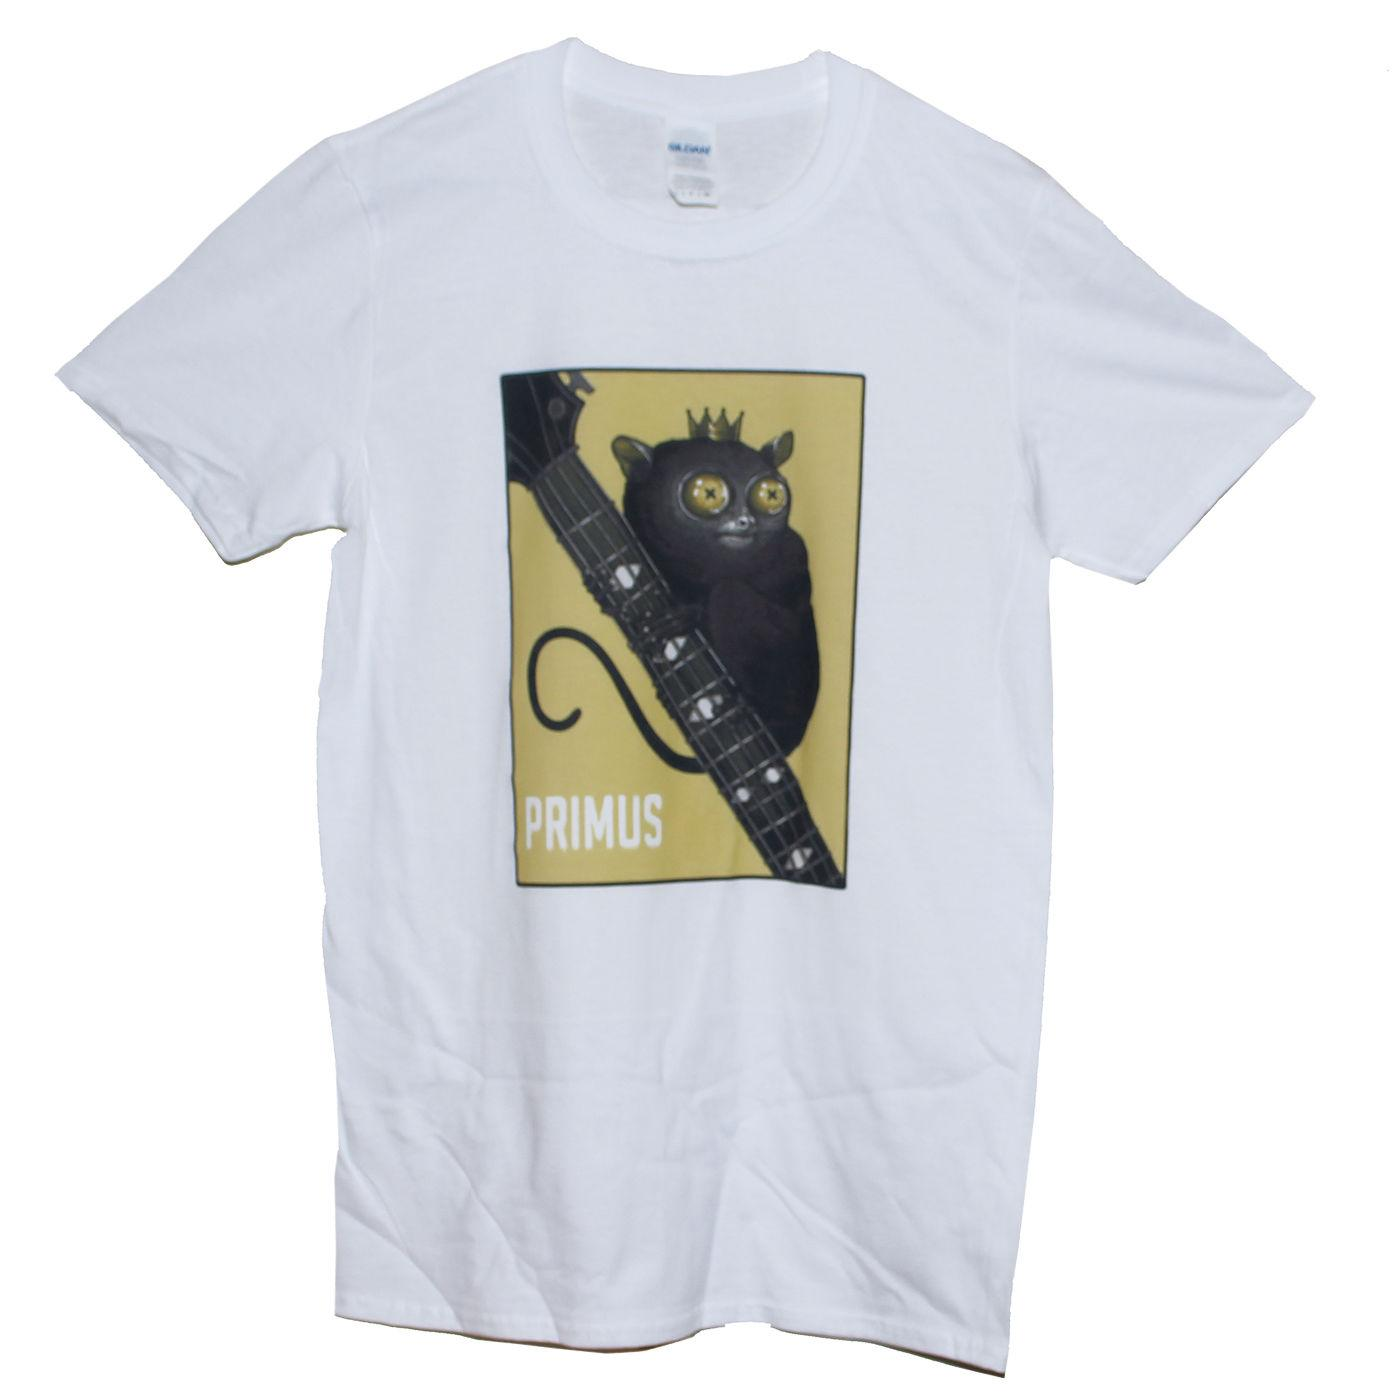 PRIMUS T SHIRT Metal Punk Rock Clutch Weezer Melvins Graphic Band Tee  Unisex Men's Clothing T-Shirts Tees Men Hot Cheap